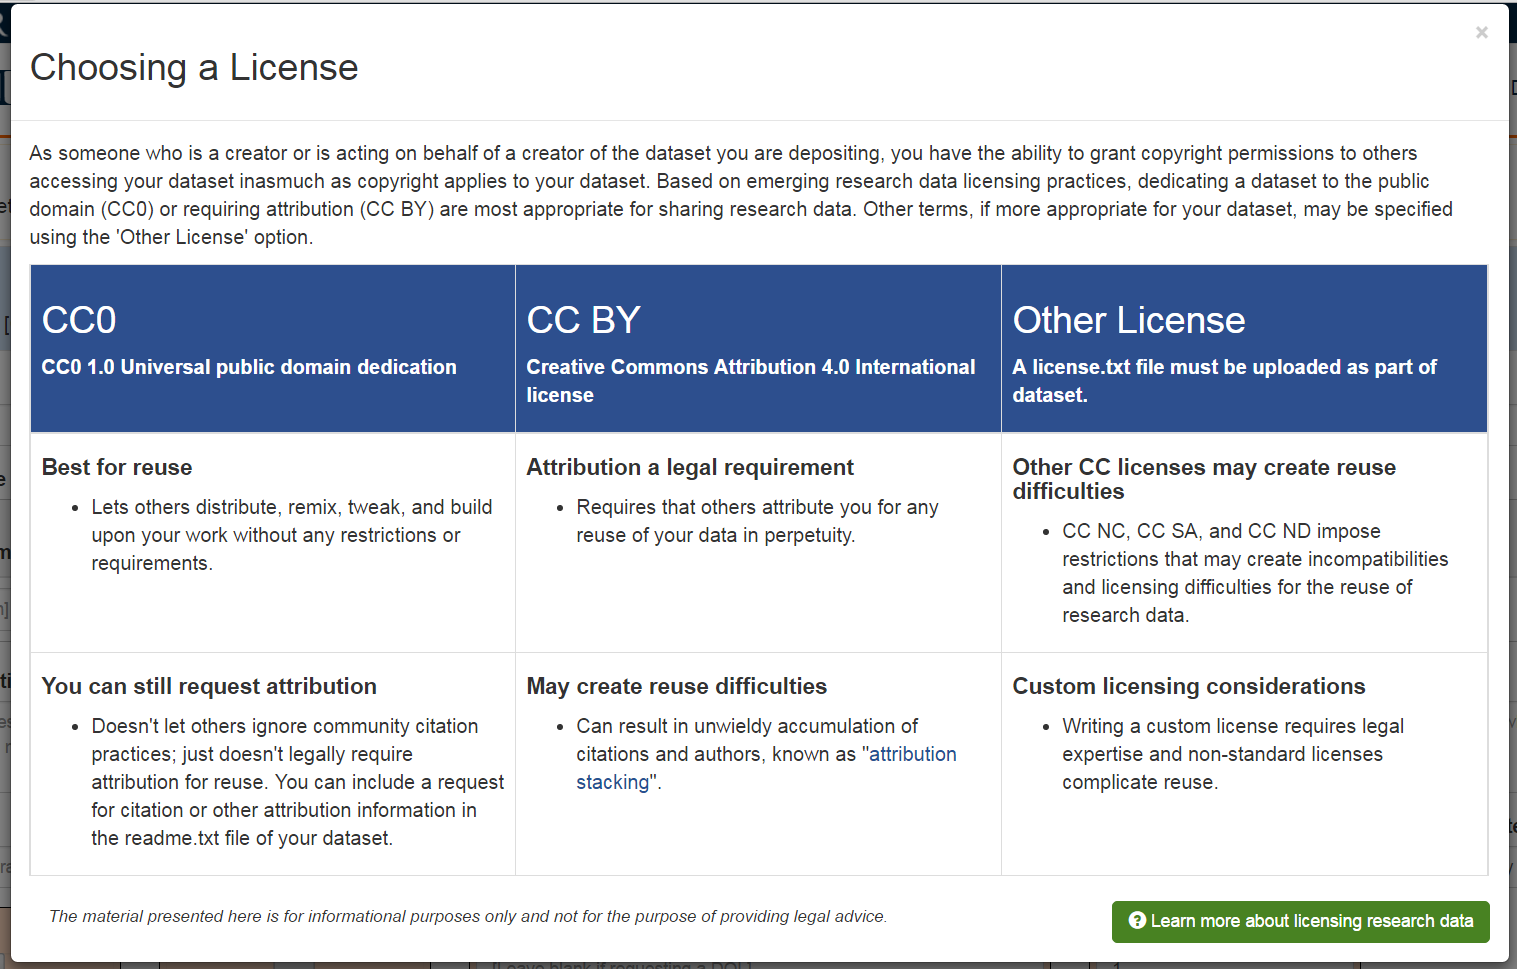 screenshot of license options on upload form